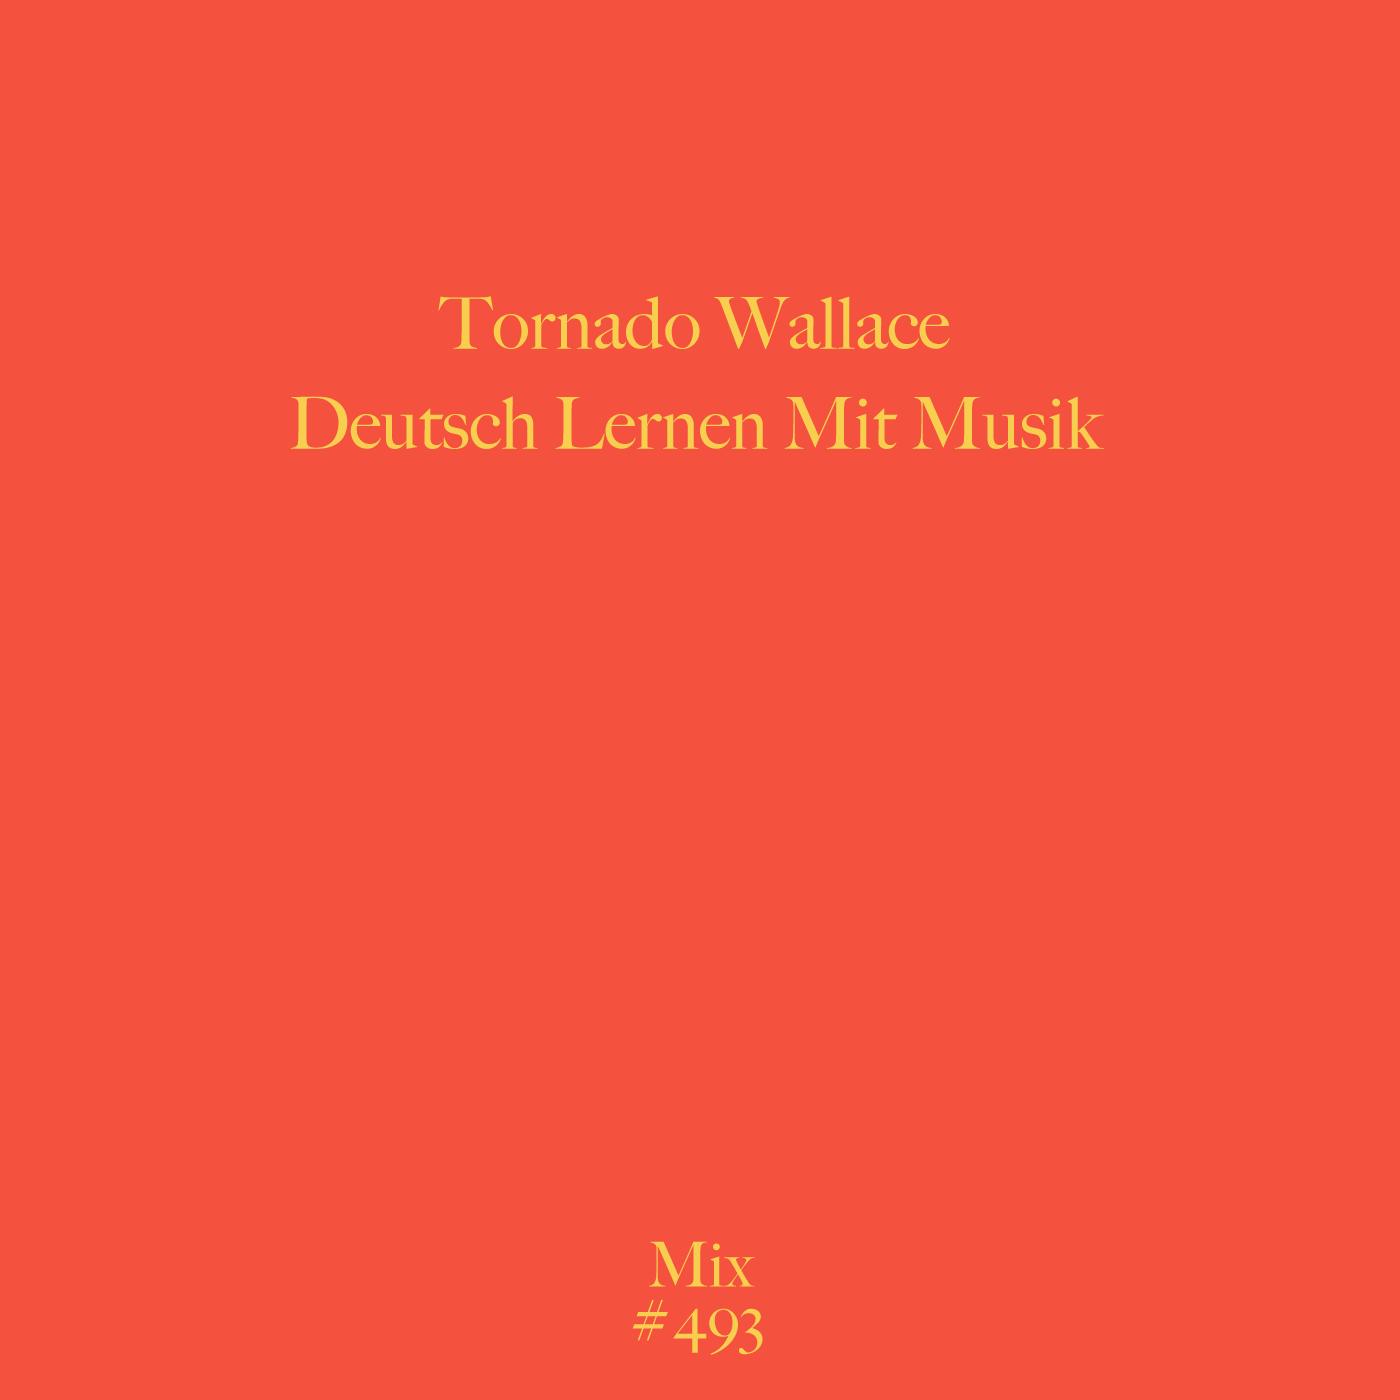 Tornado Wallace, Mix, Test Pressing, German language, mix